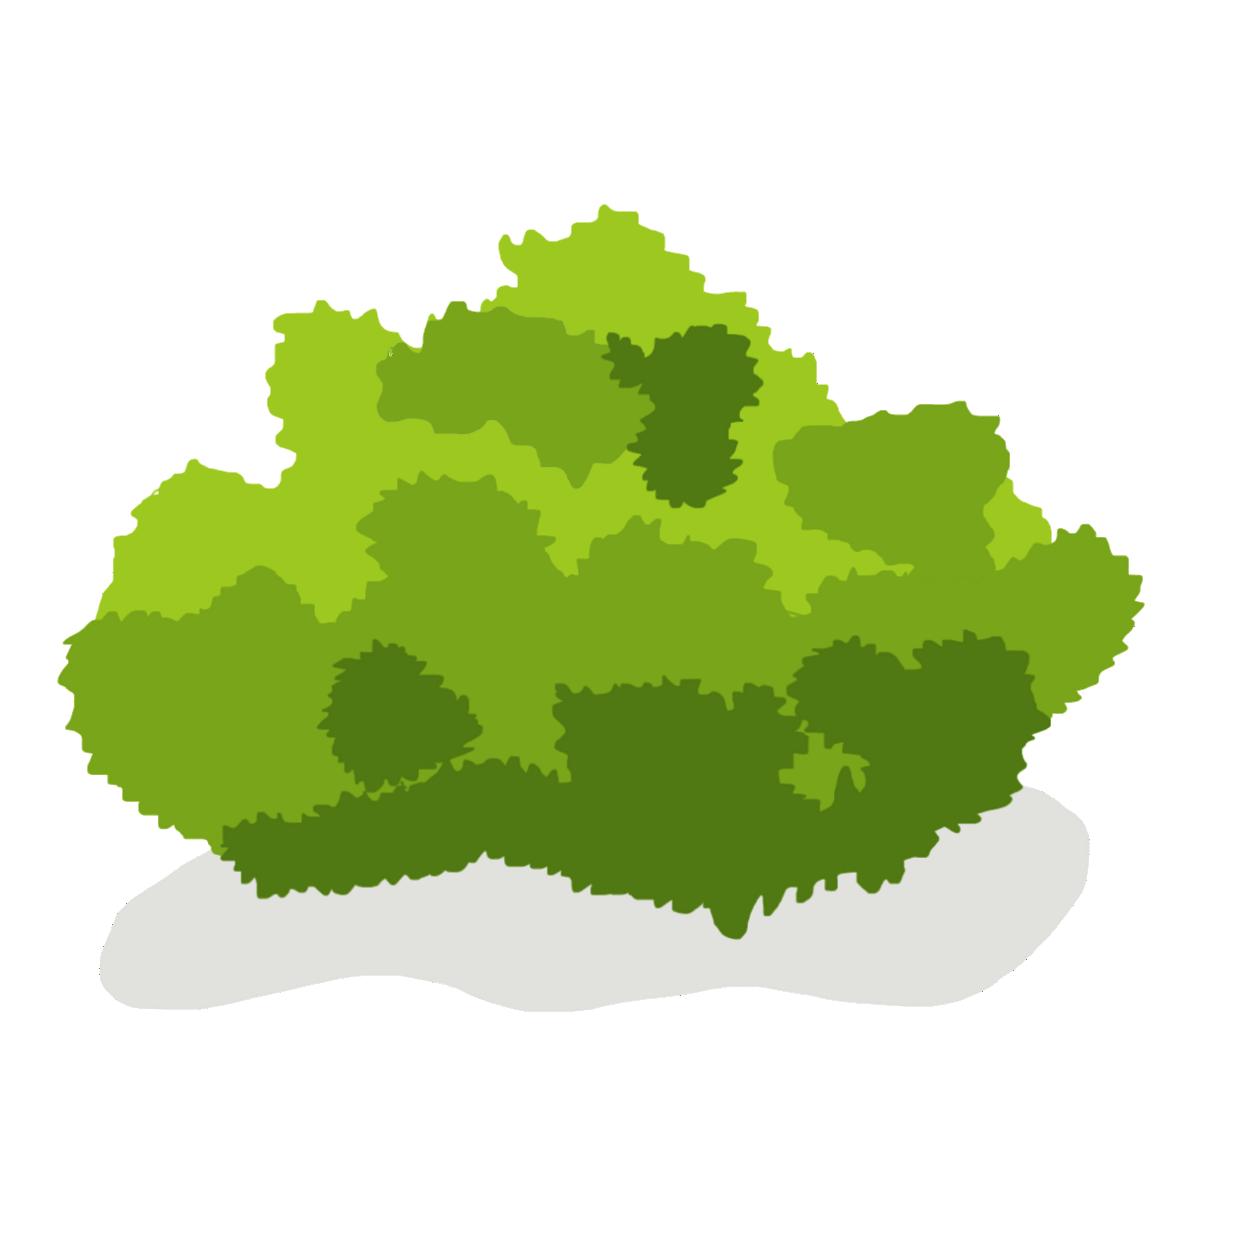 Bushes clipart animated. Bush free images at